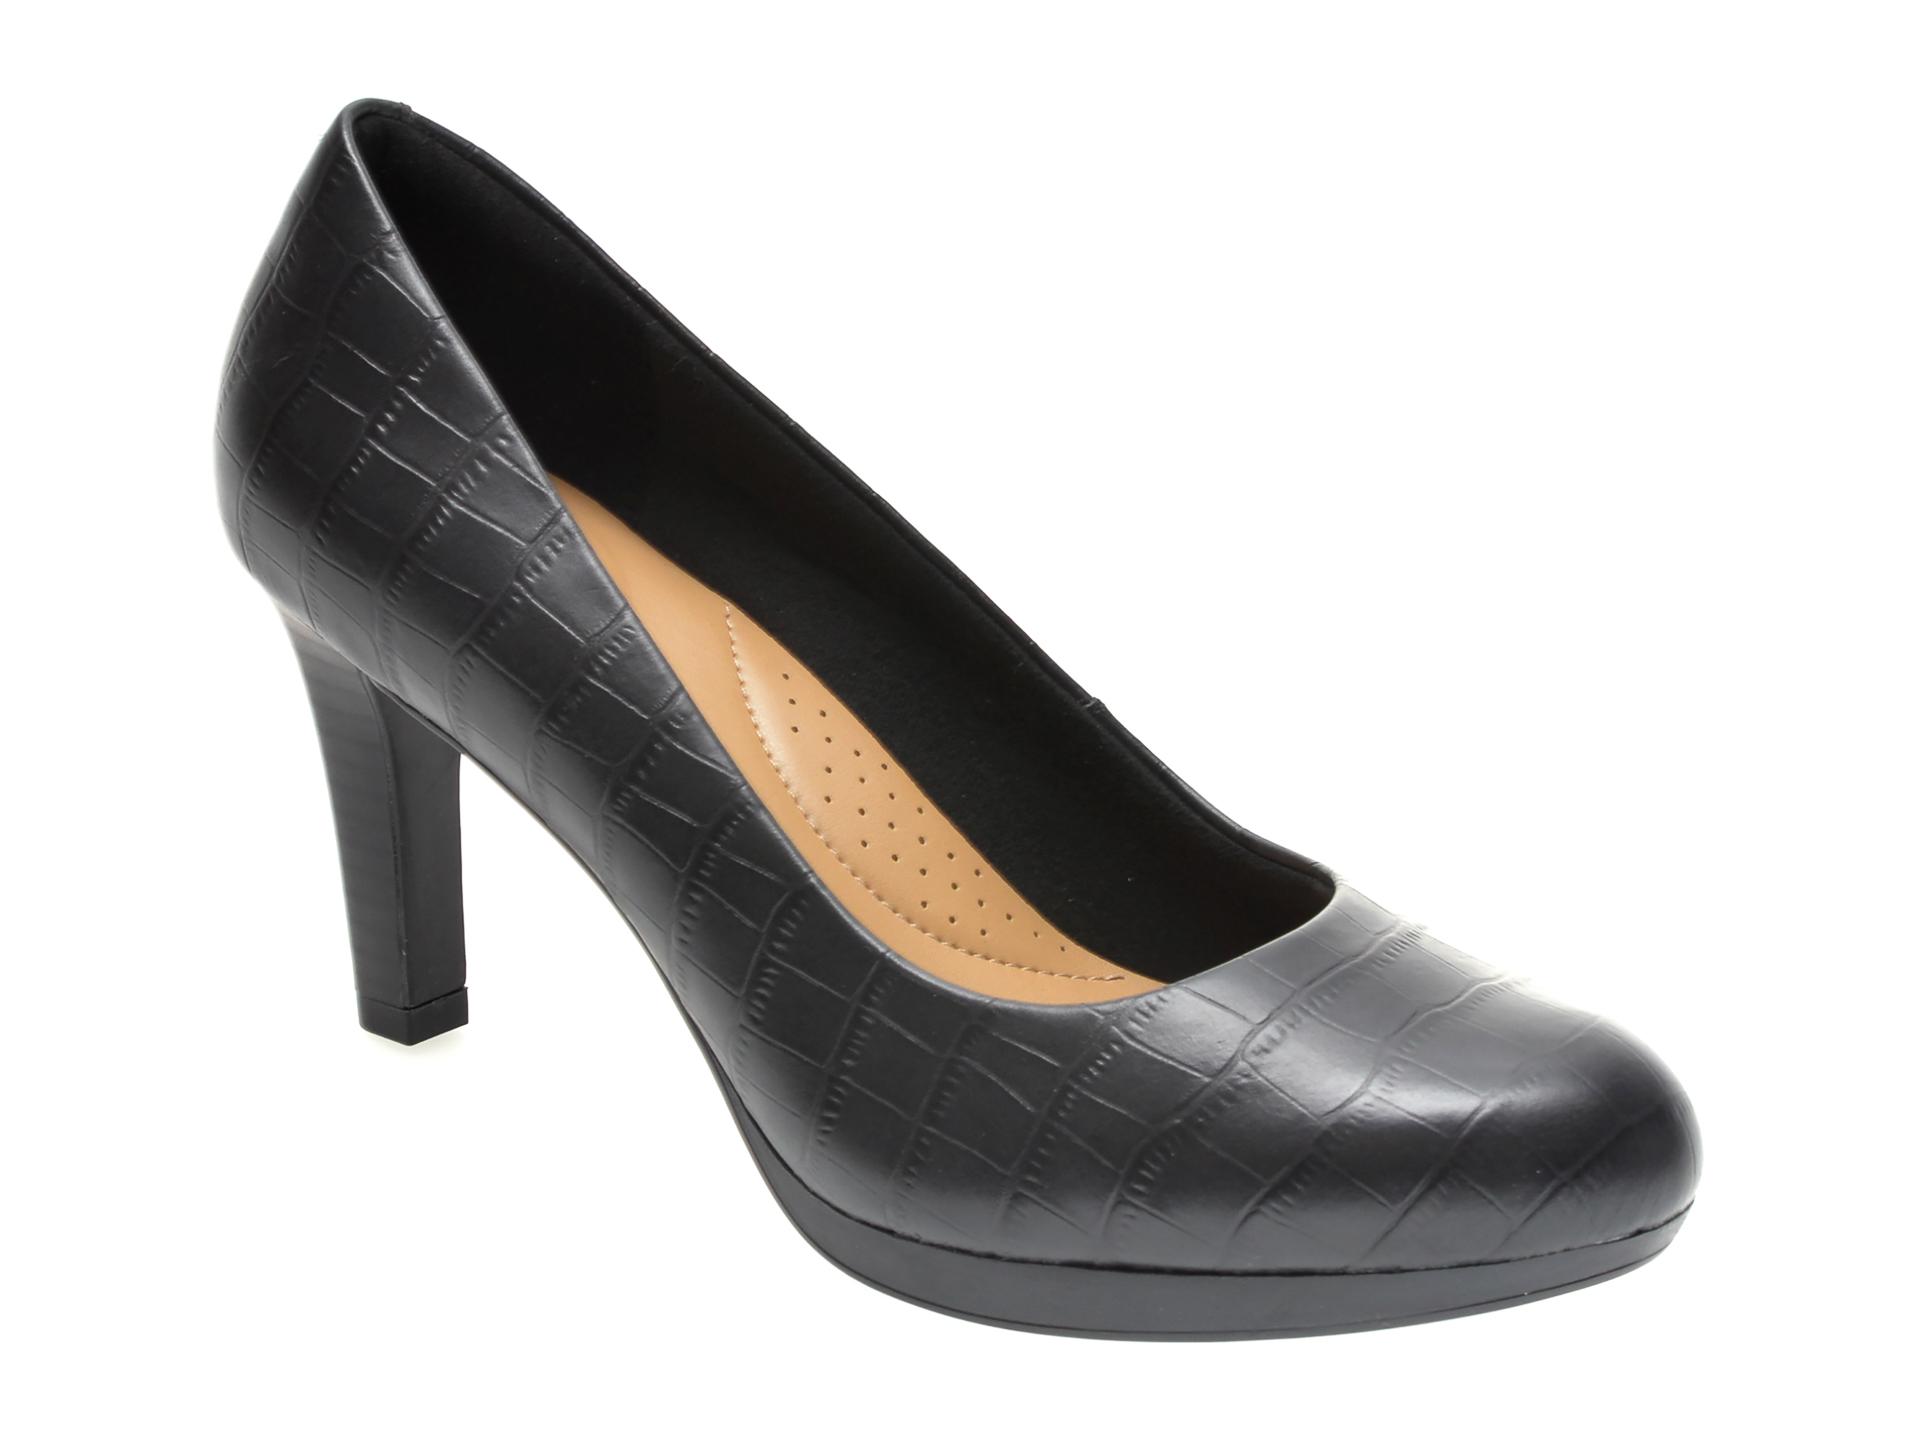 Pantofi CLARKS negri, ADRIEL VIOLA, din piele croco imagine